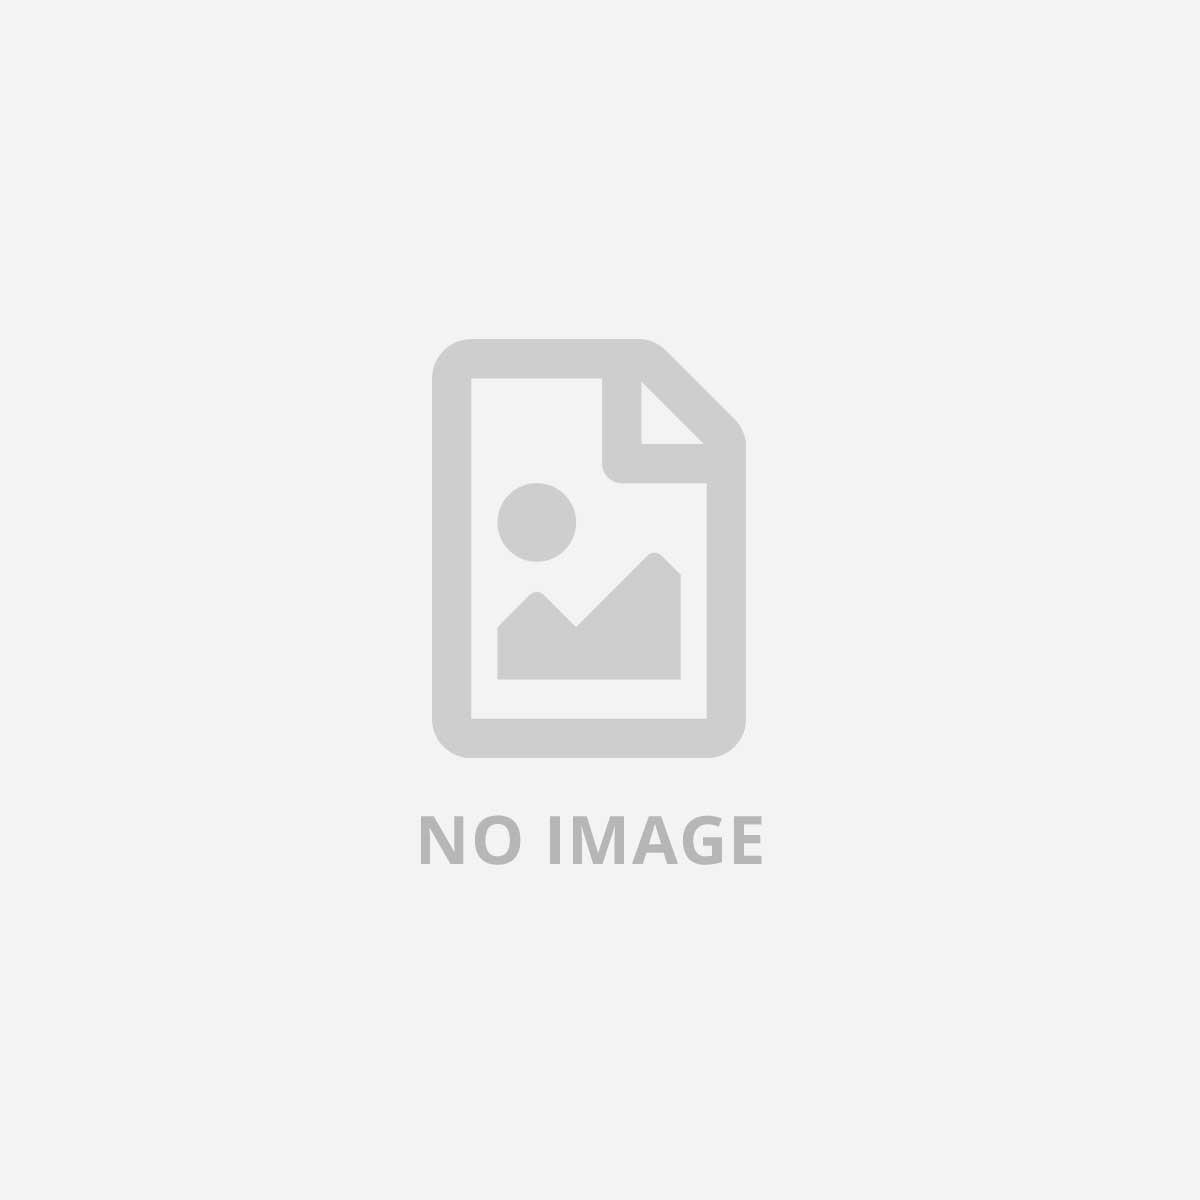 NILOX CAVO USB 2.0 1.8MT M/M A/B